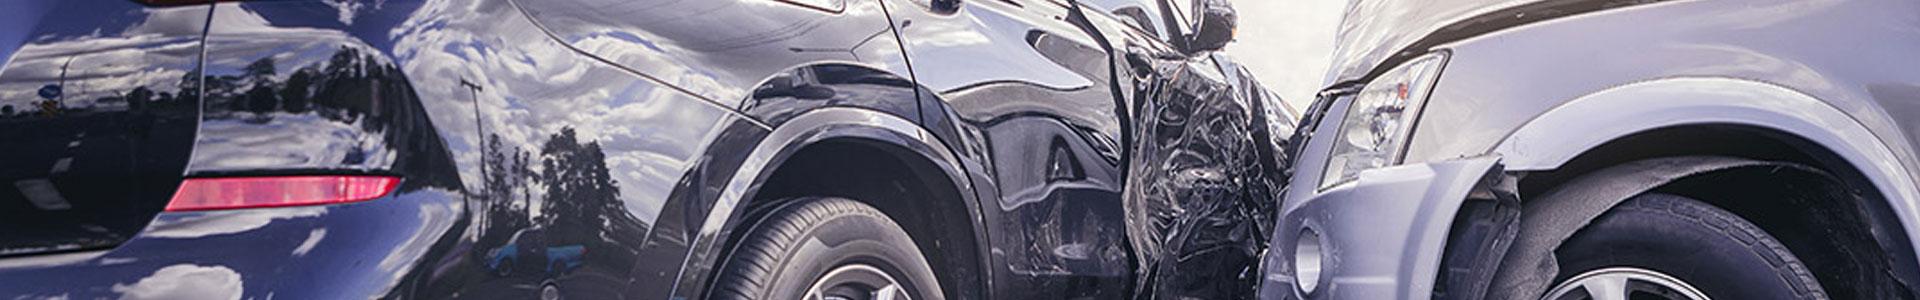 Recupero veicoli bricherasio torino